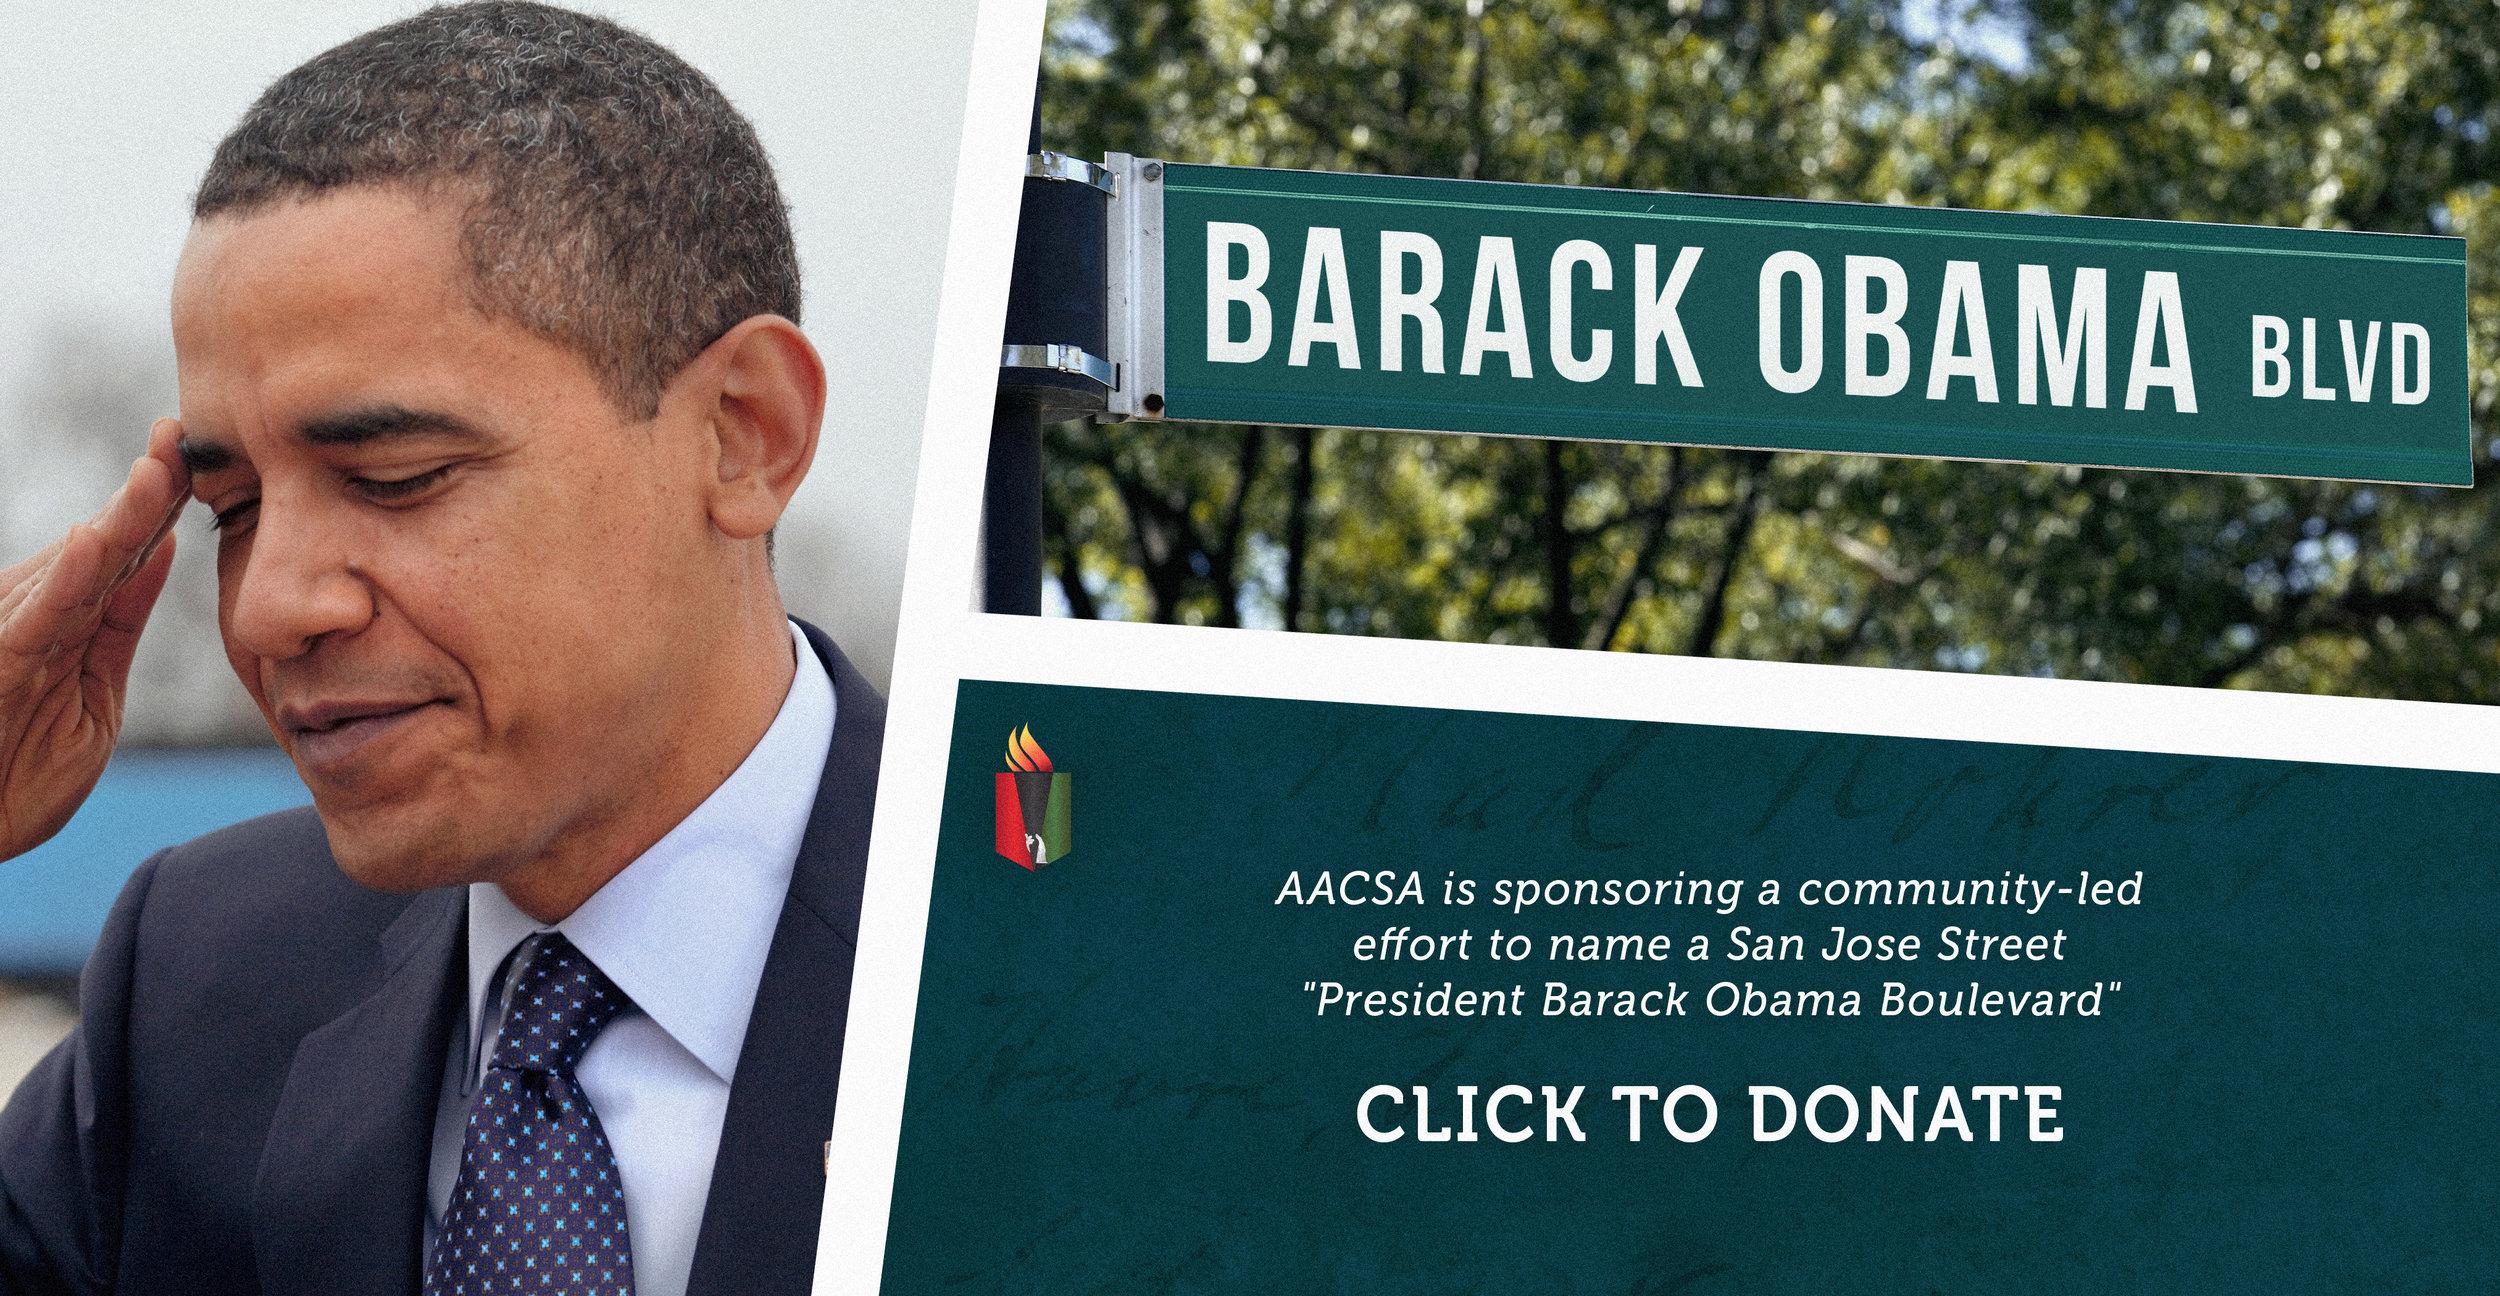 AACSA-Barack-Obama-Blvd.jpg